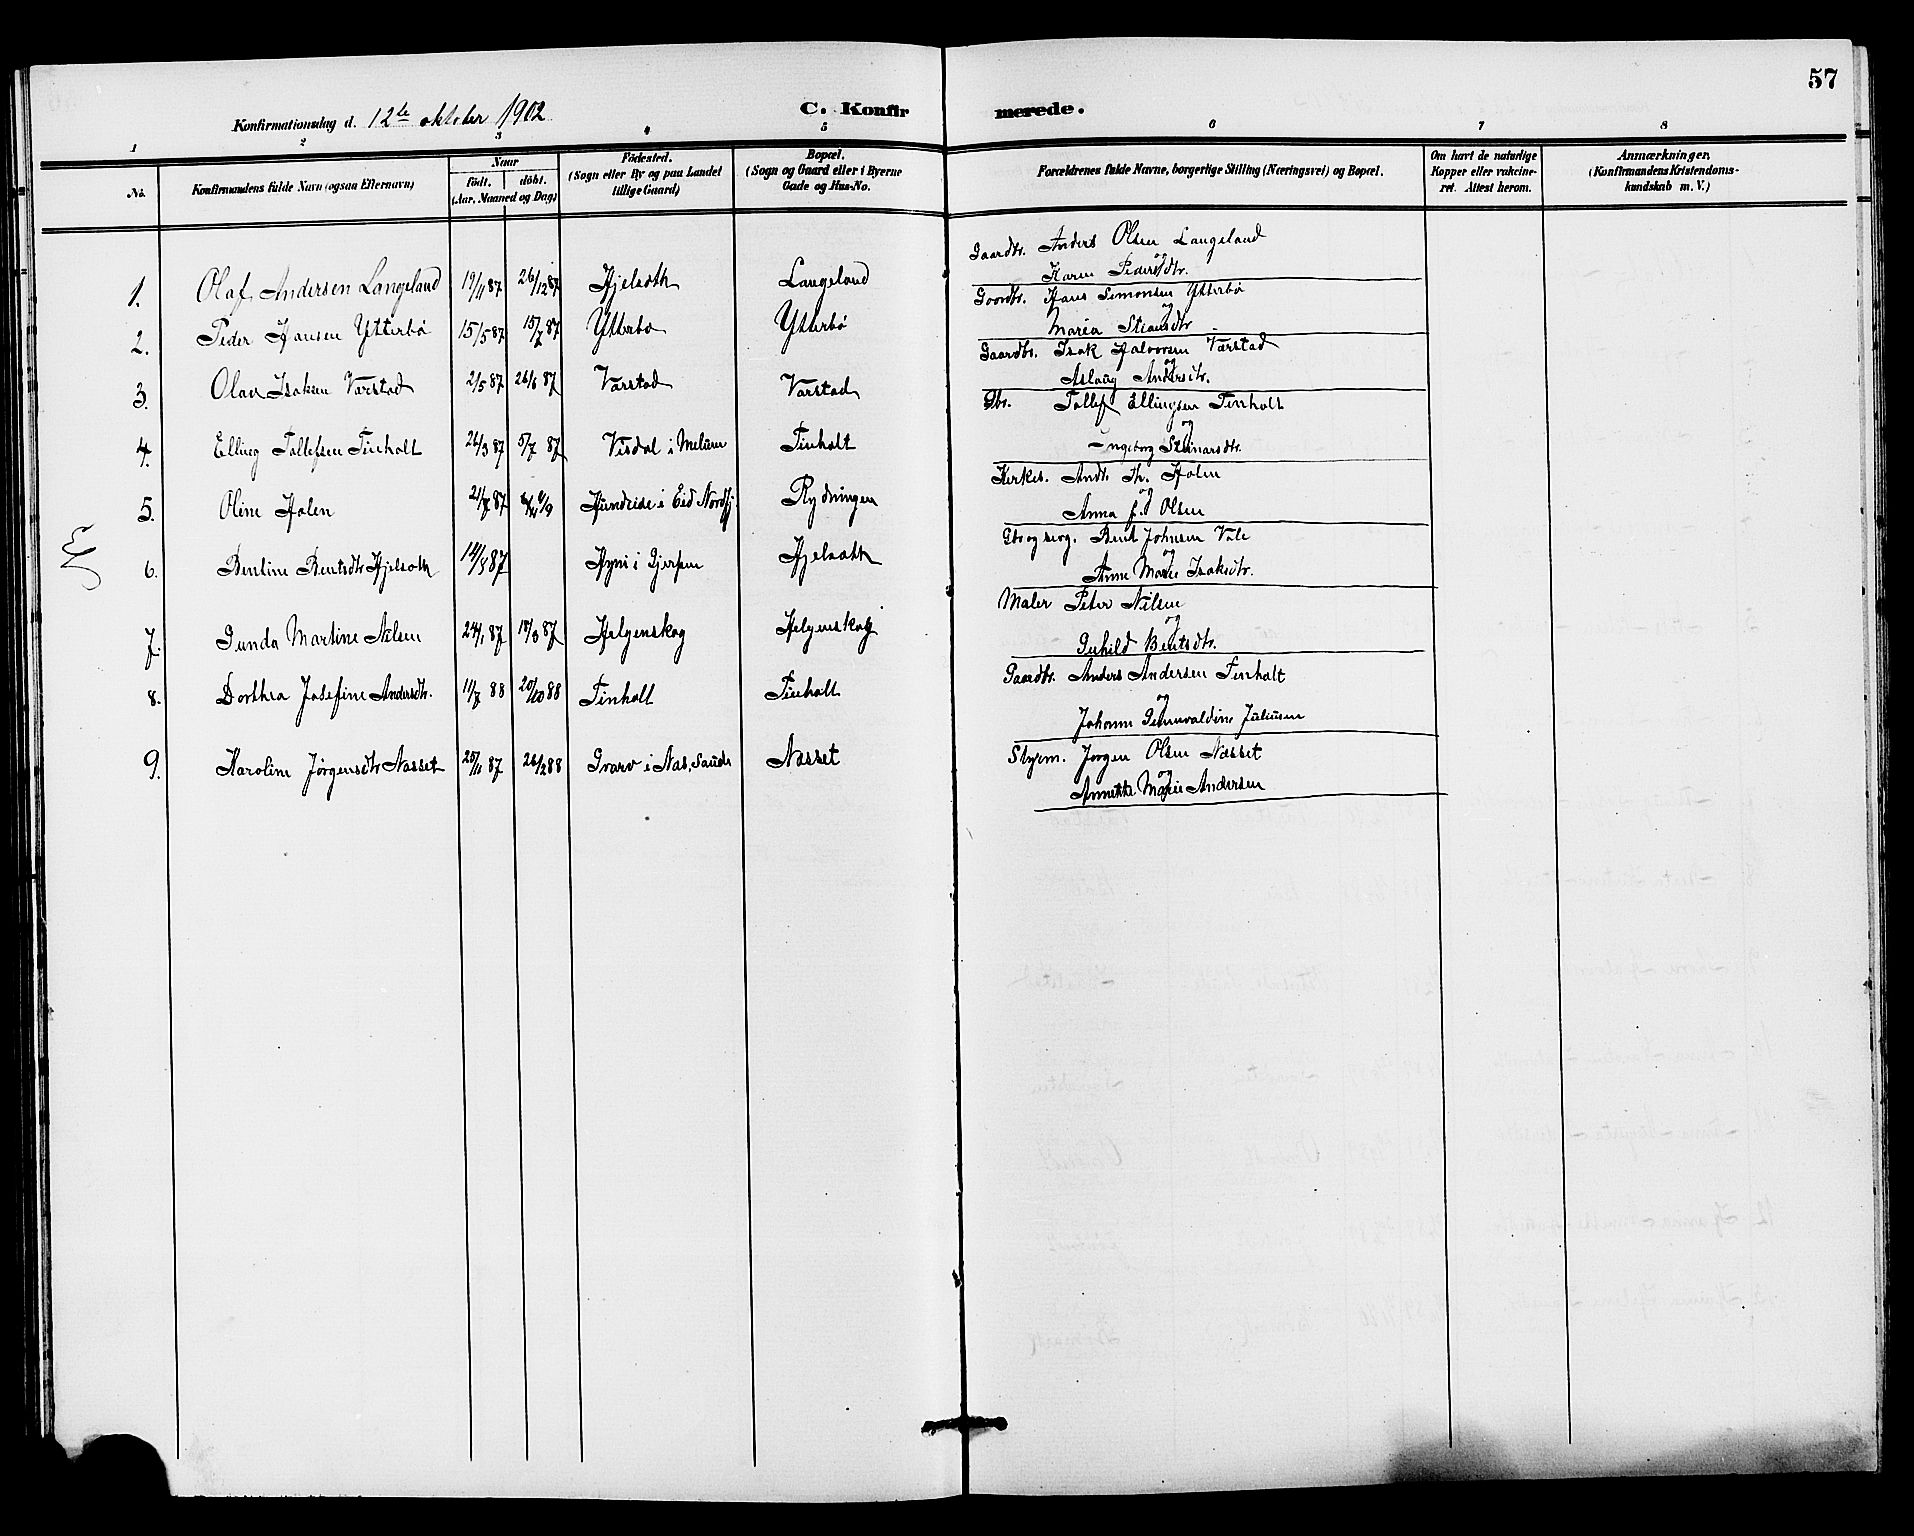 SAKO, Holla kirkebøker, G/Gb/L0002: Klokkerbok nr. II 2, 1897-1913, s. 57